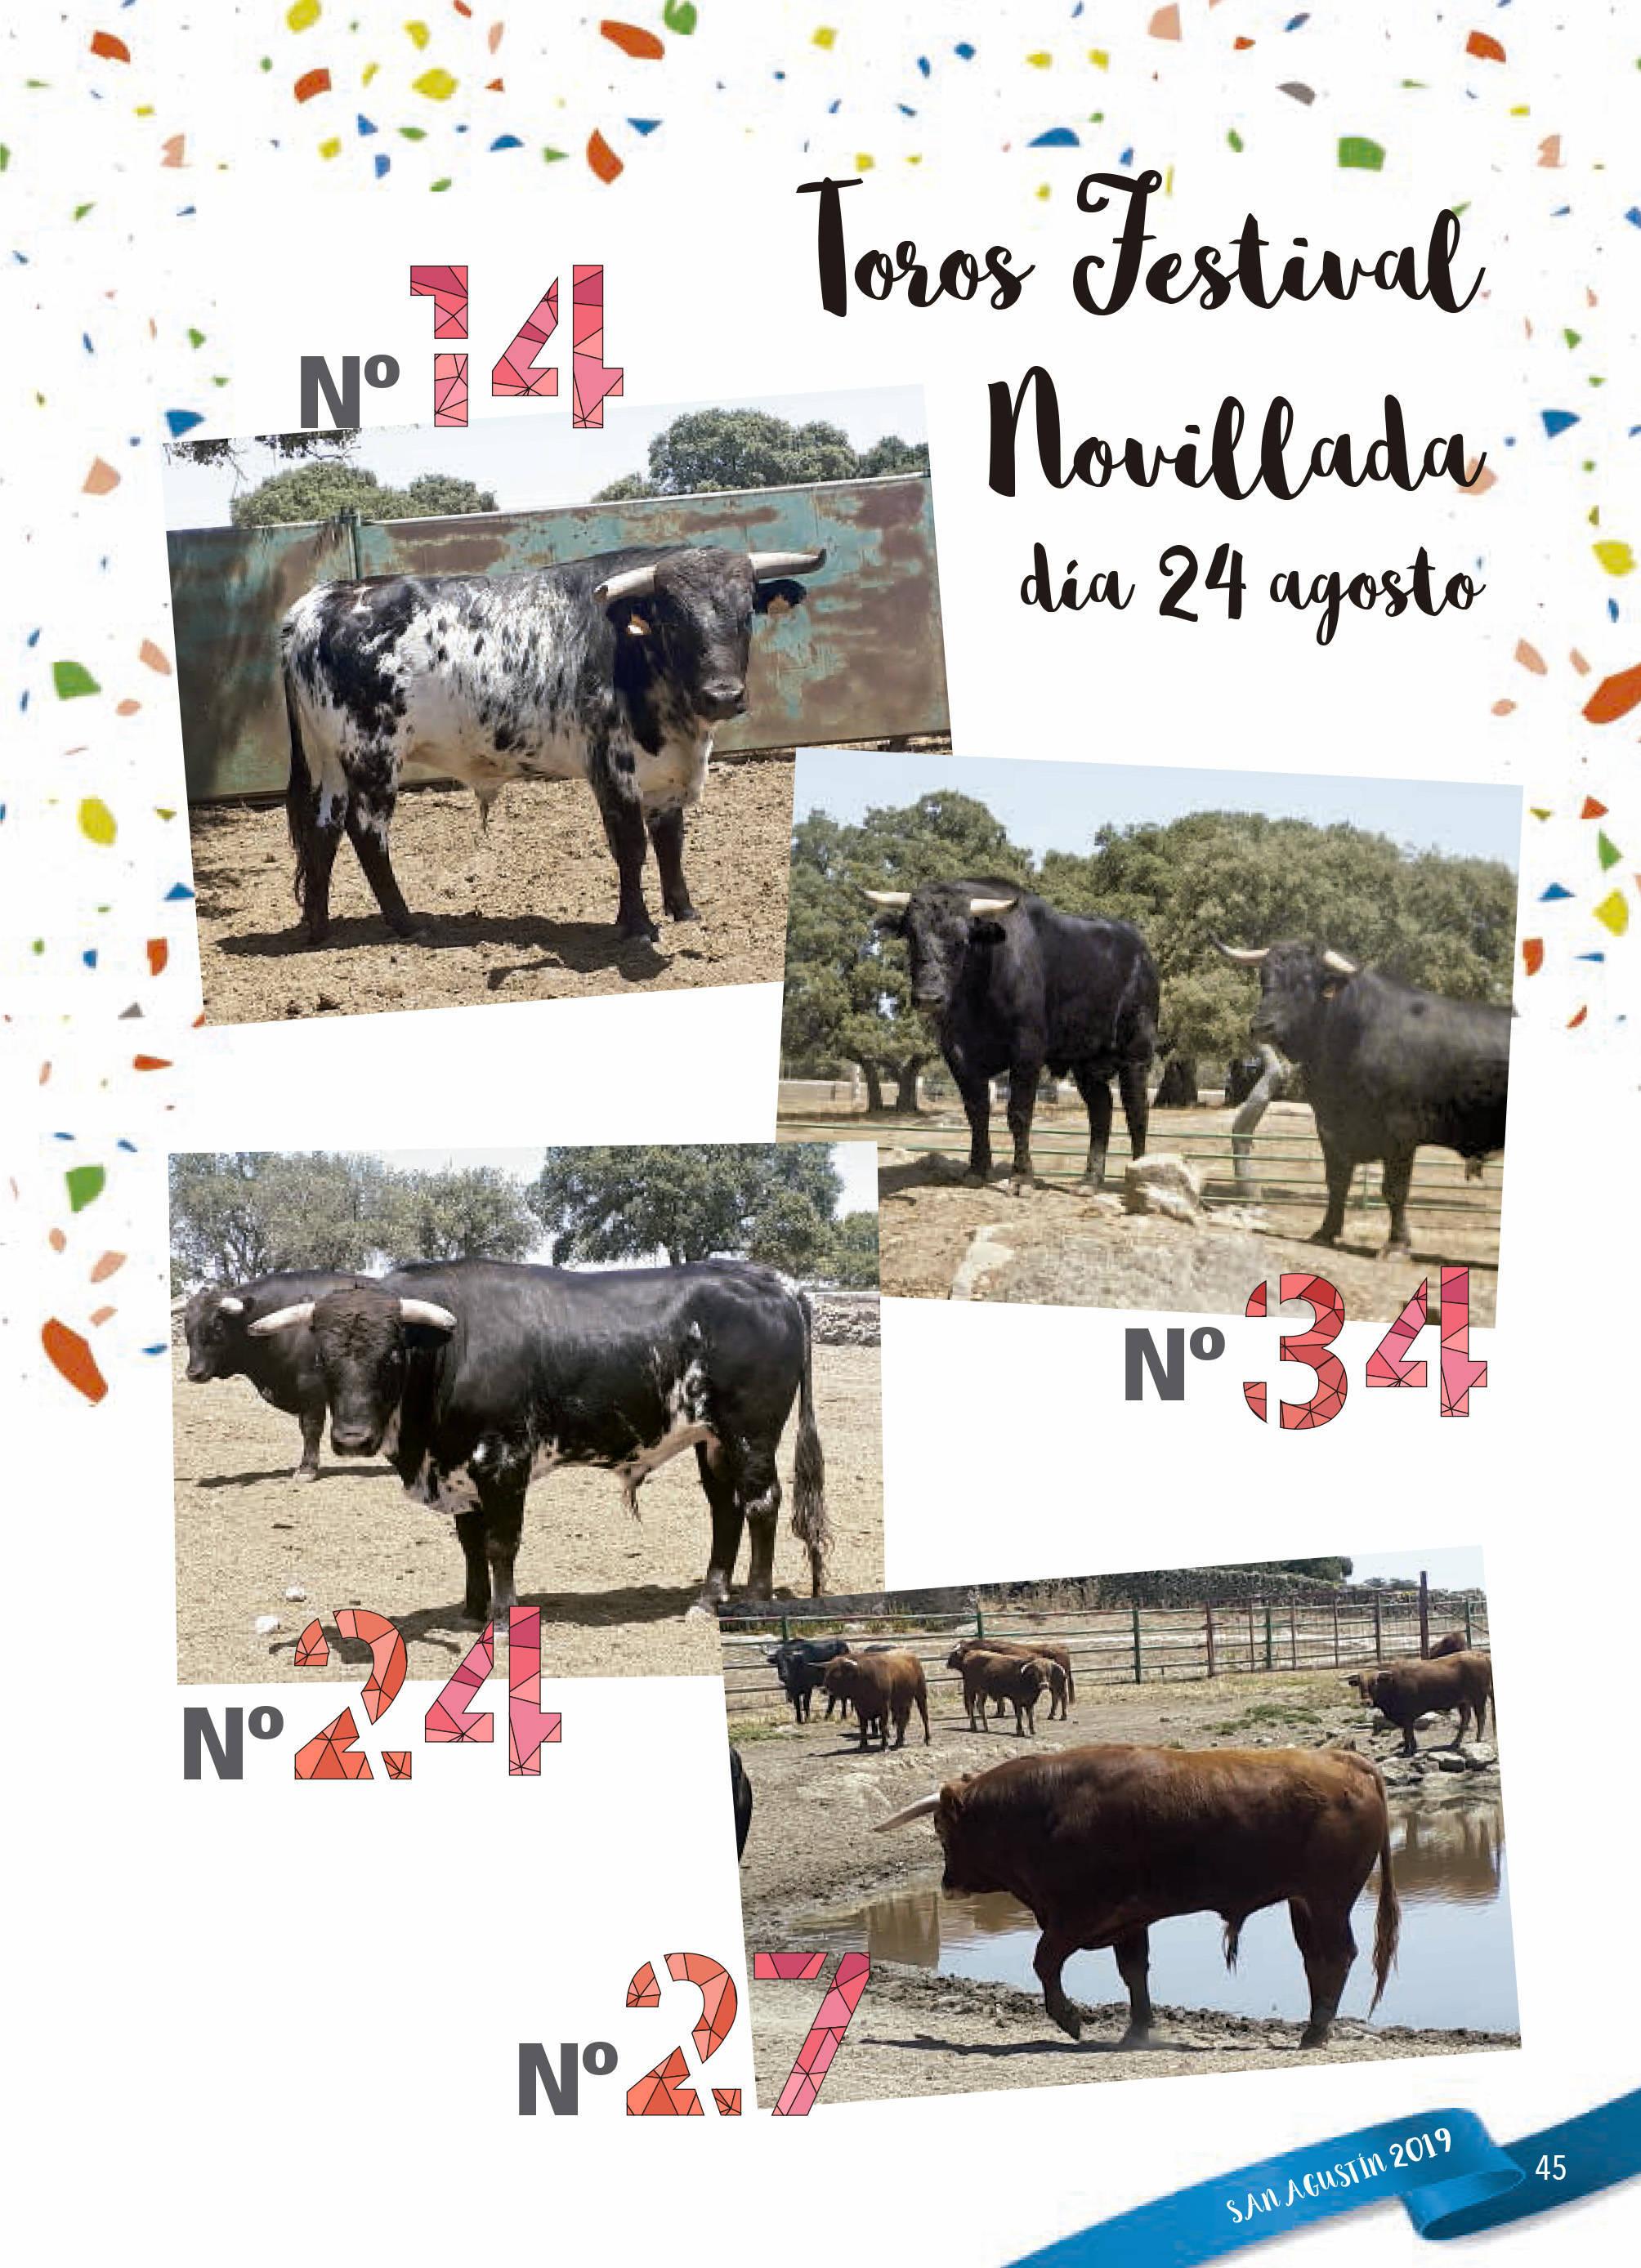 Programa de ferias y fiestas 2019 - Fermoselle (Zamora) 17